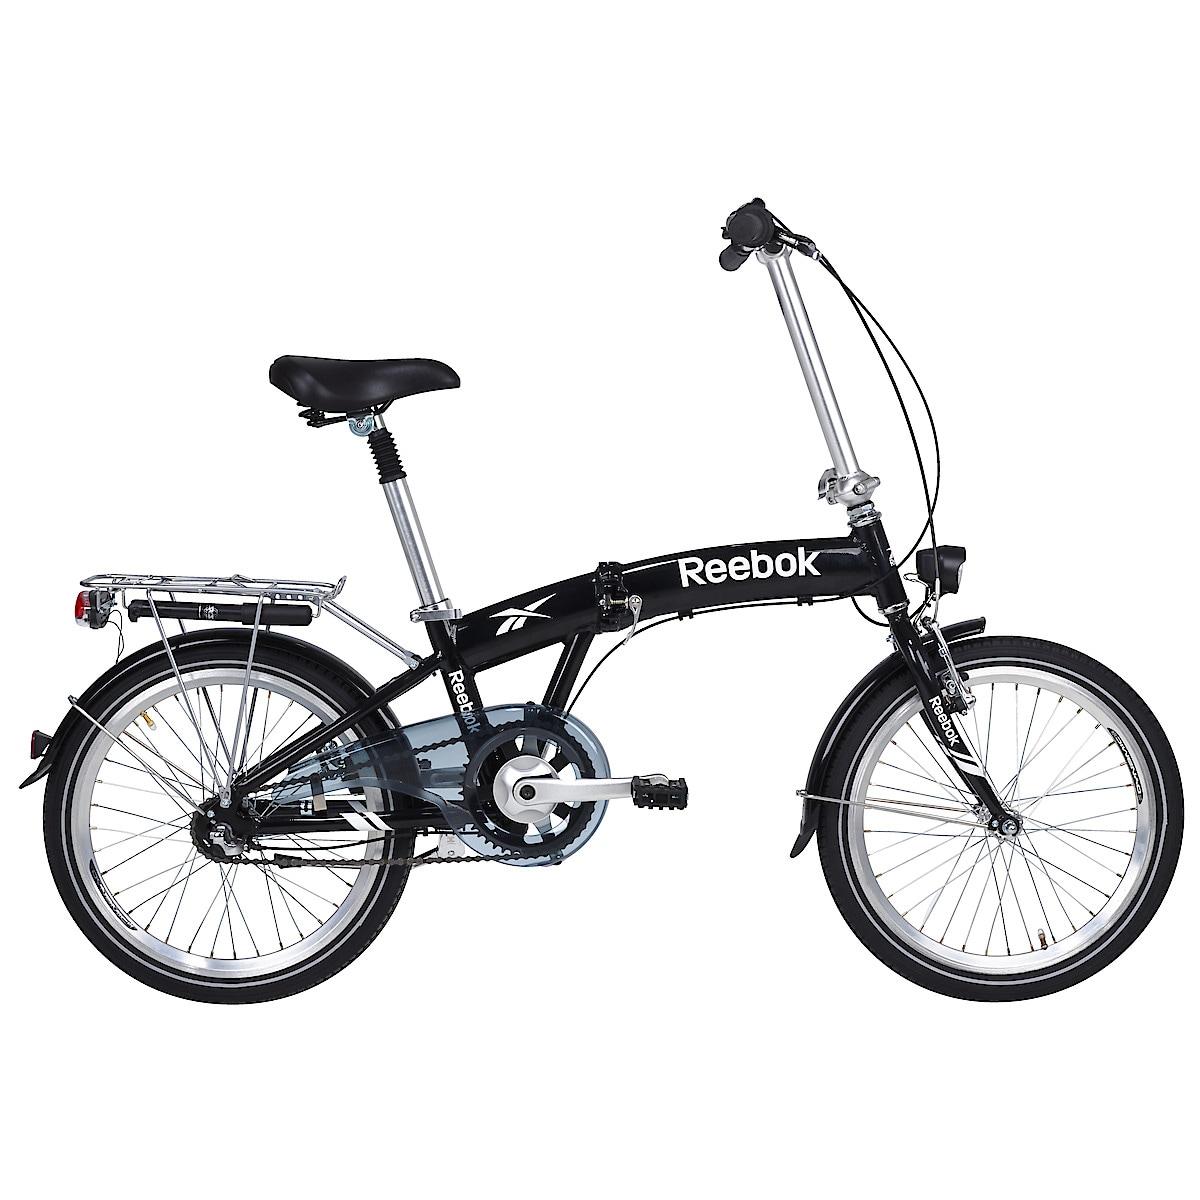 Reebok Switch Folding Bicycle